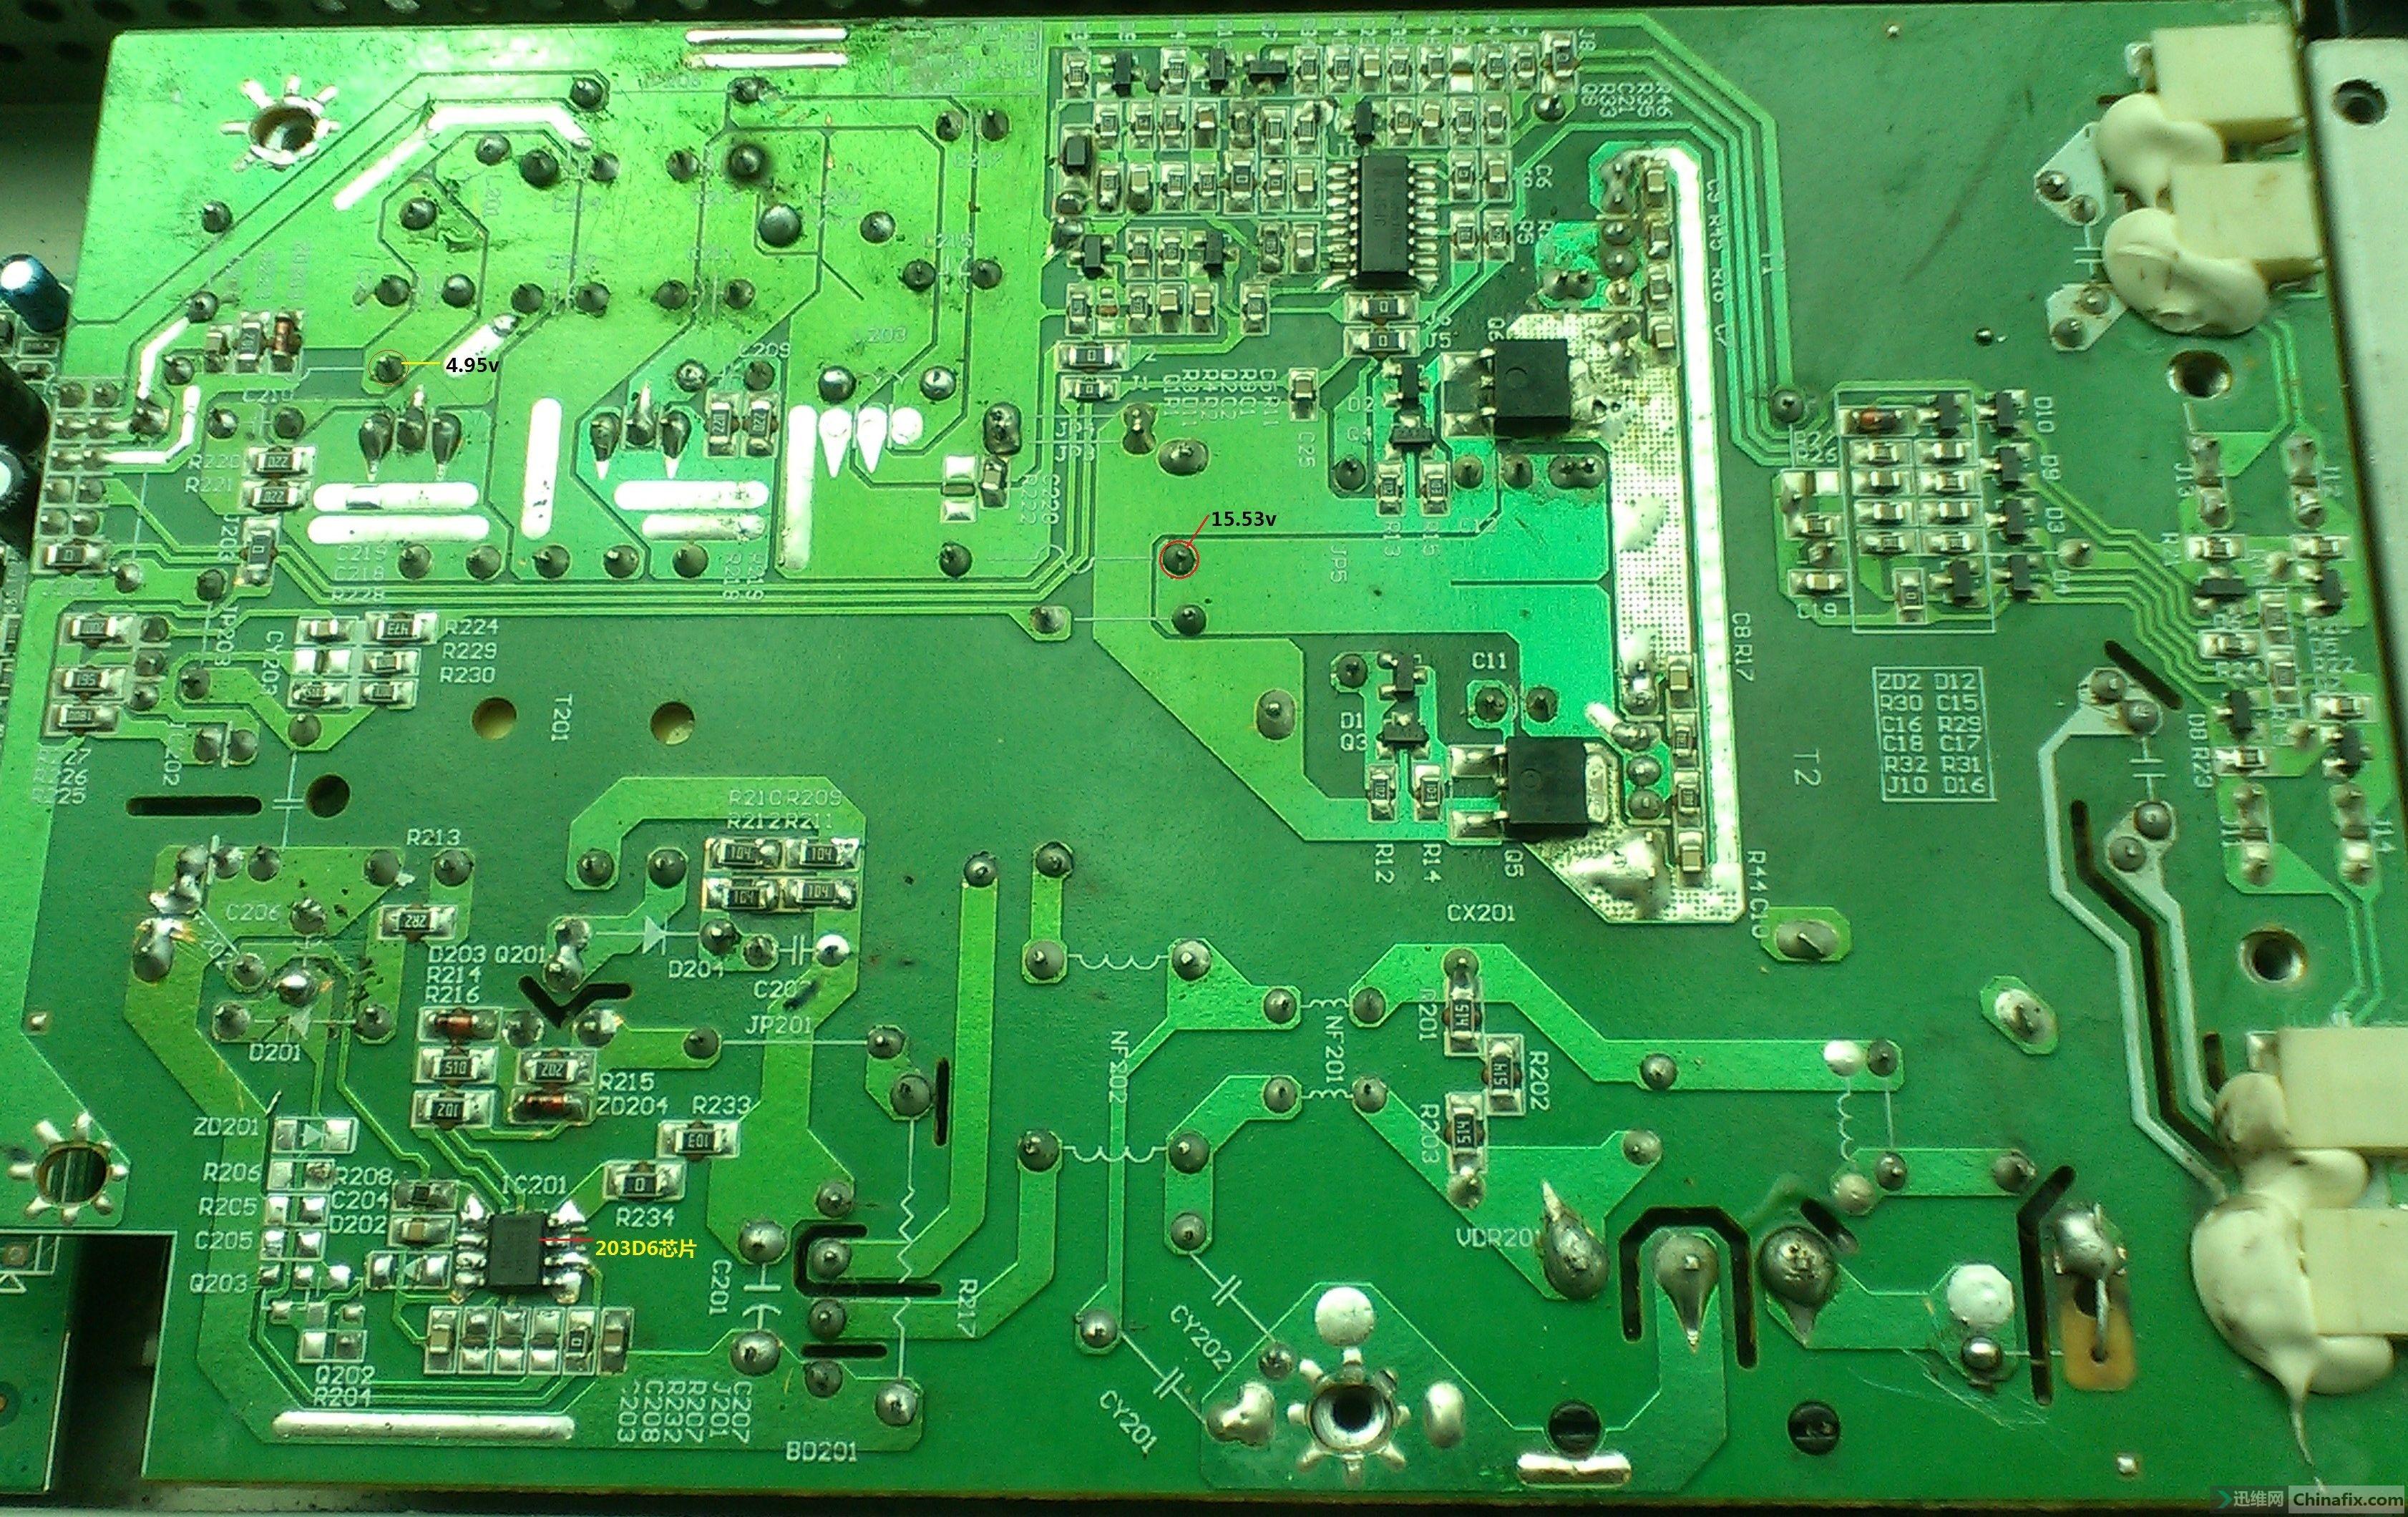 203d6芯片电源 高压电路板反面图9.jpg